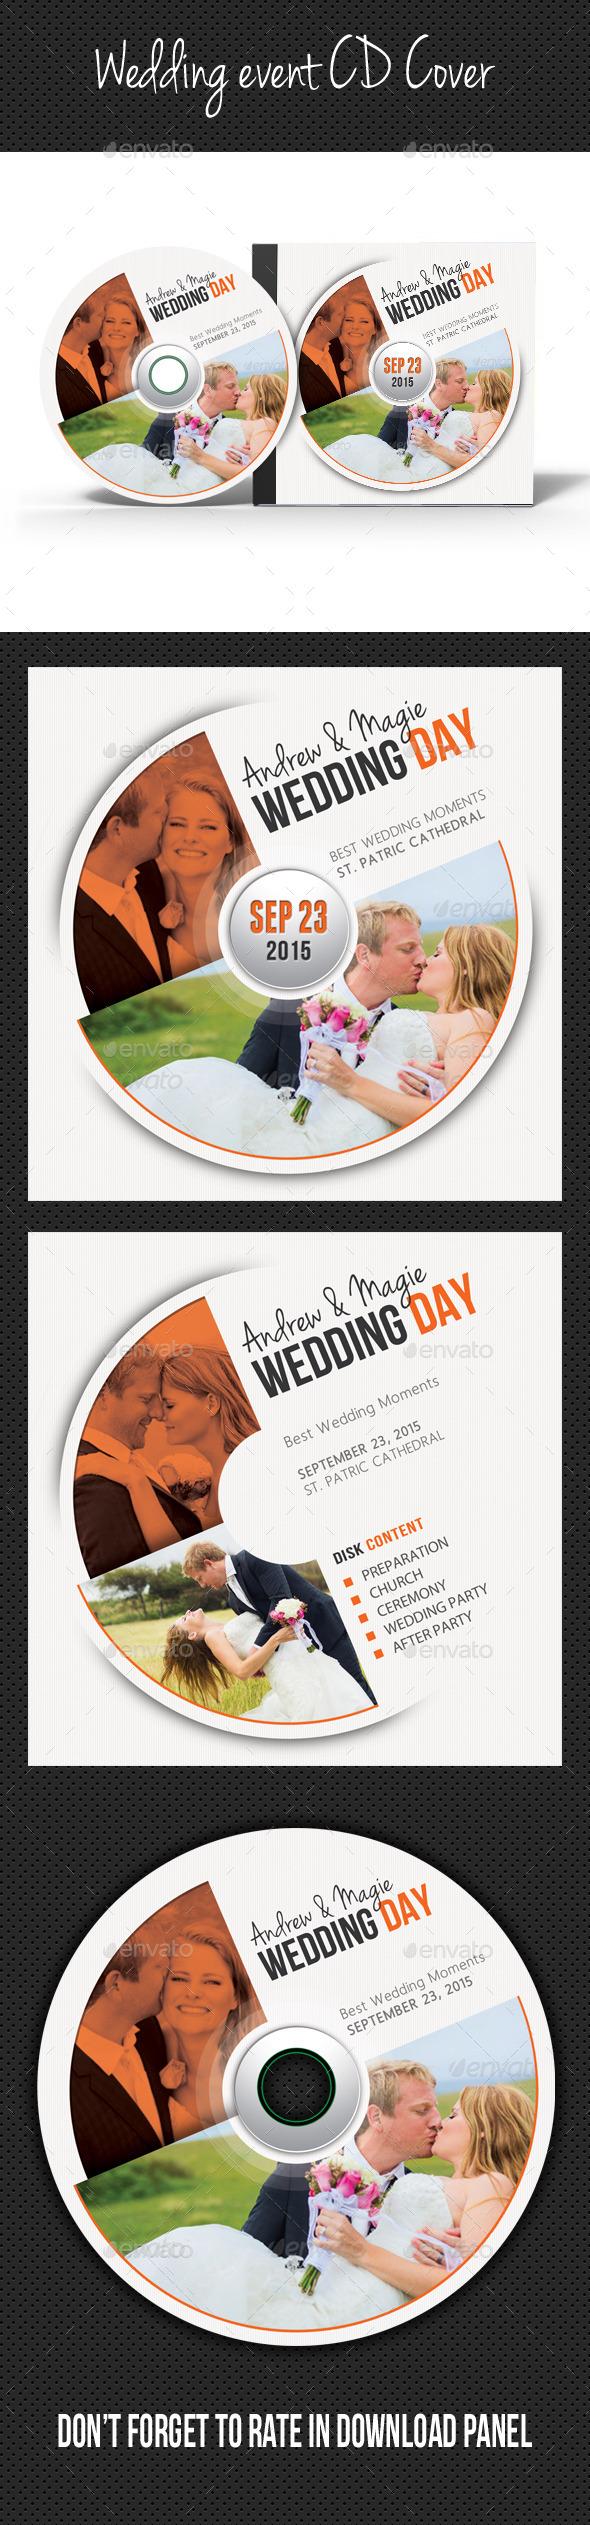 Wedding Event CD Cover V09 - CD & DVD Artwork Print Templates